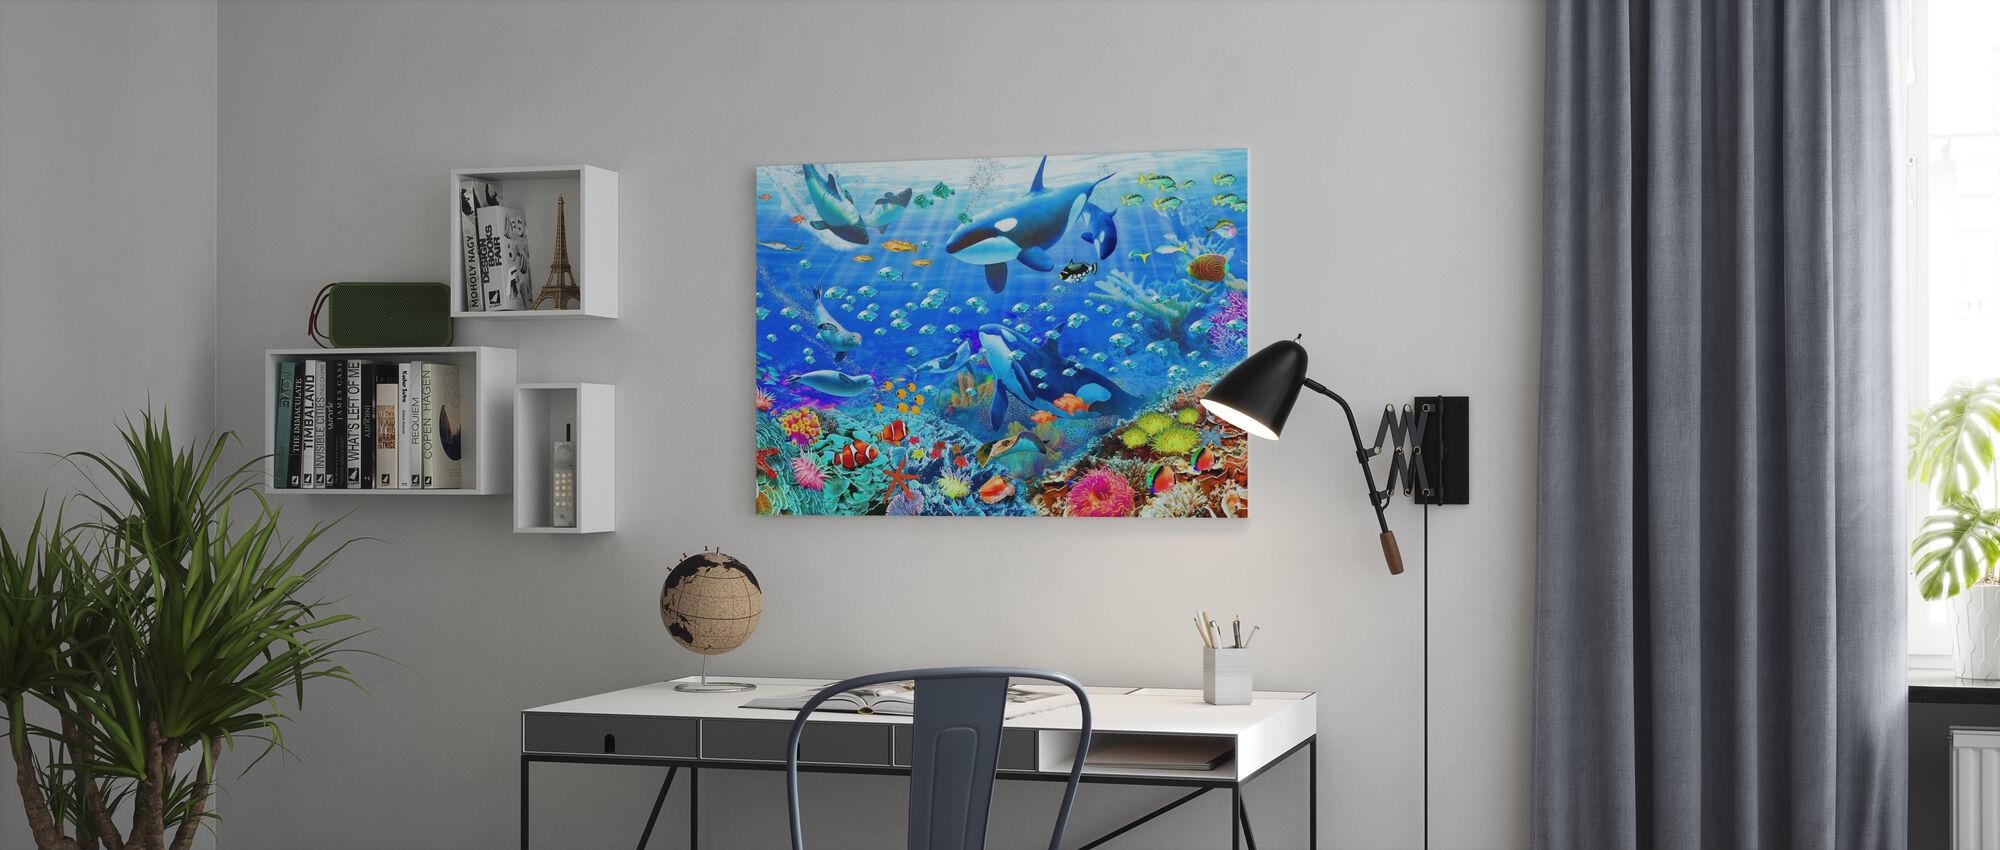 Underwater Panorama - Canvas print - Office